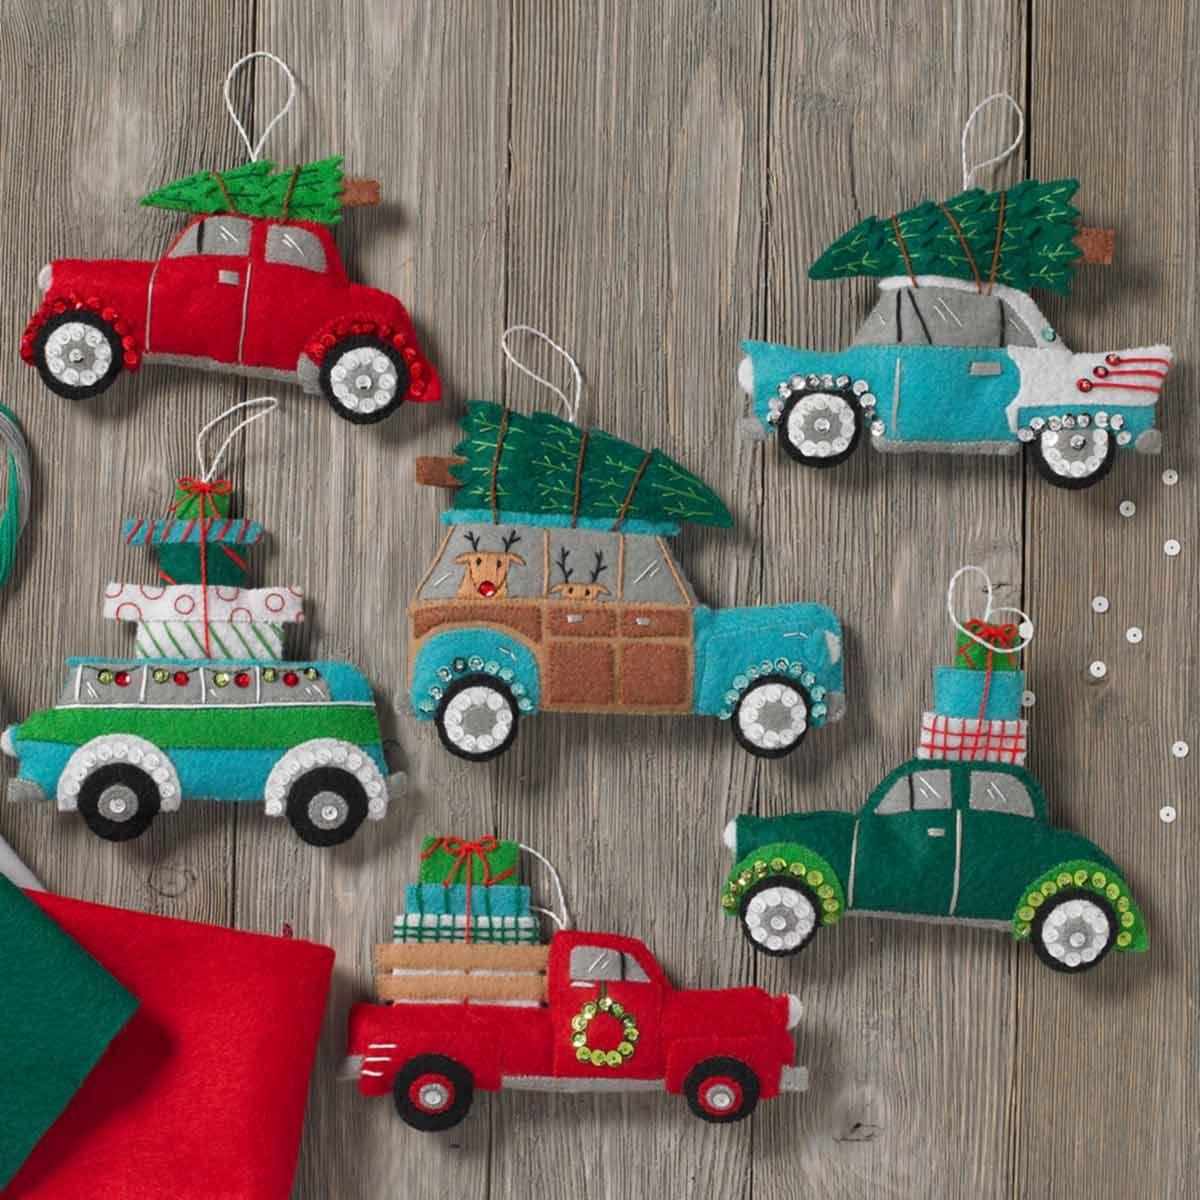 Shop Plaid Bucilla ® Seasonal Felt Ornament Kits